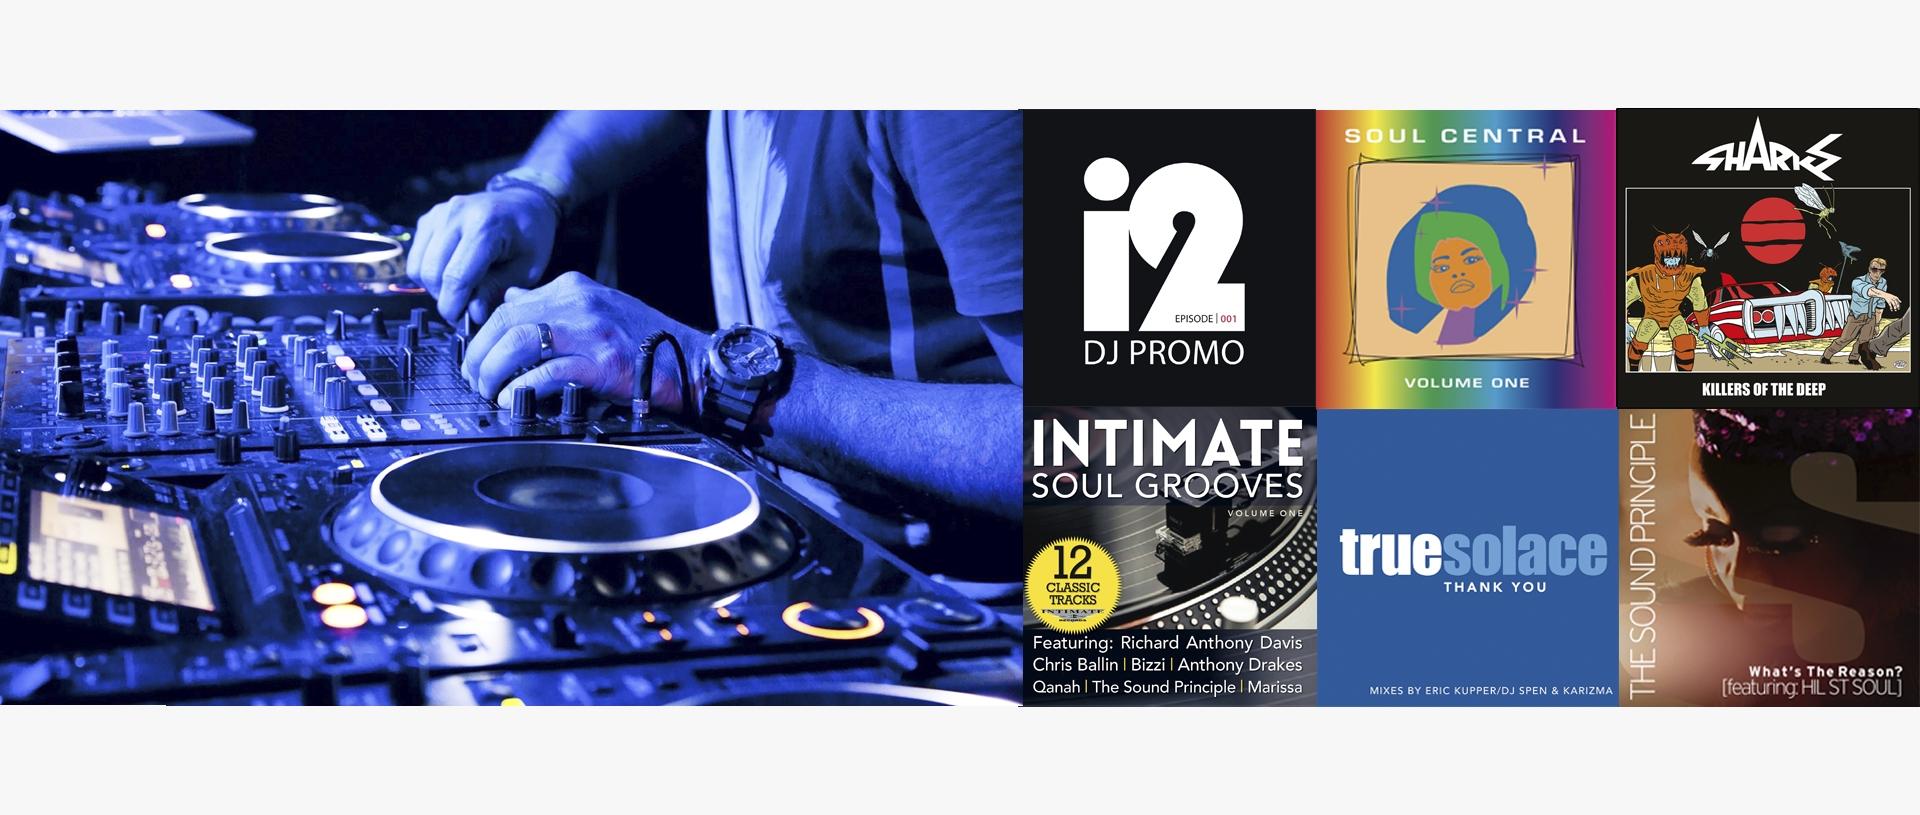 i2 Music Group